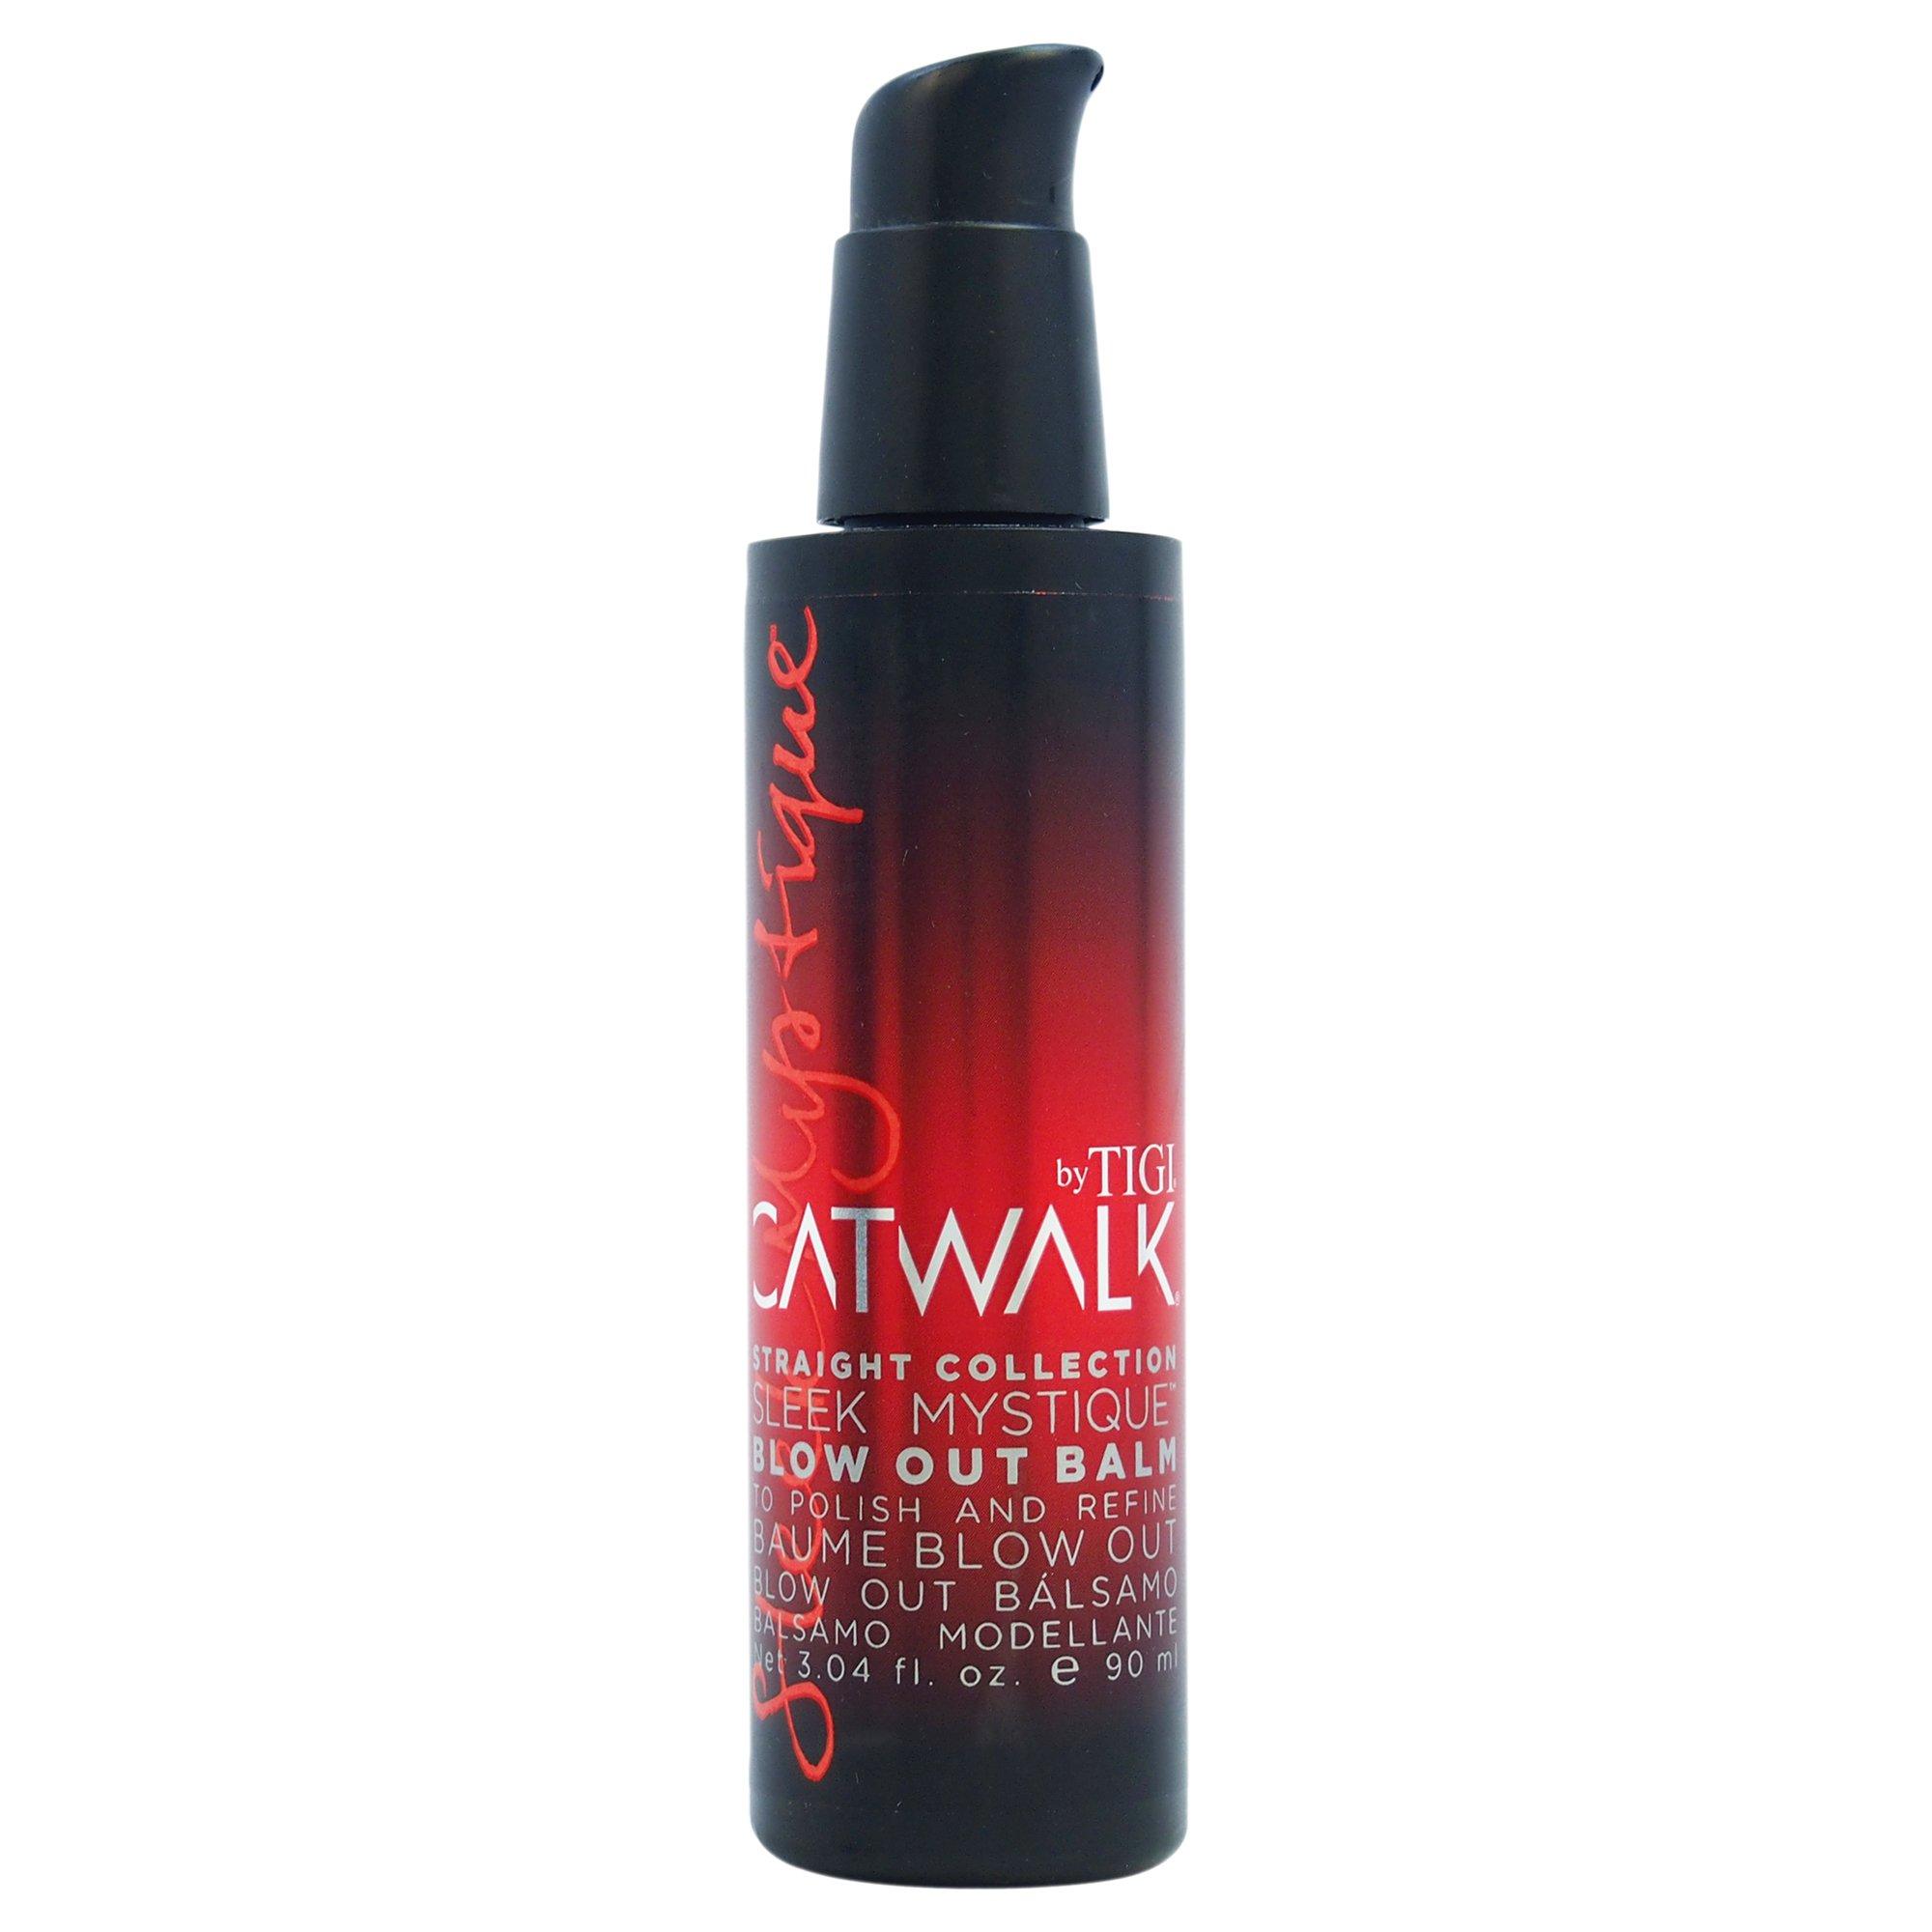 TIGI Catwalk Sleek Mystique Blow out Balm - 90 ml